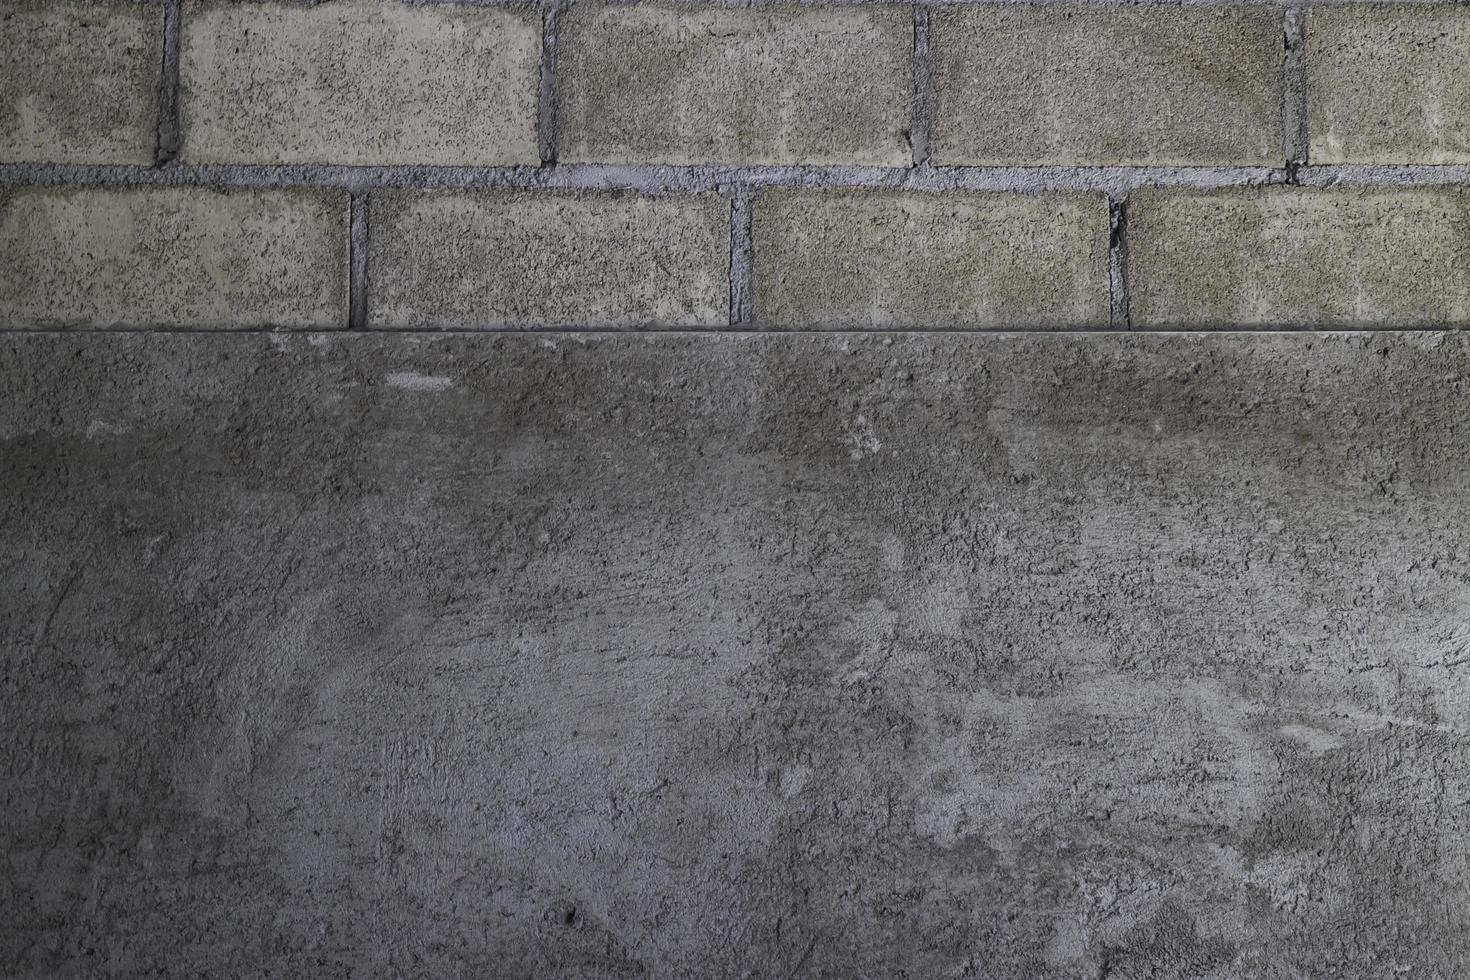 Minimaler Stil Betonwand foto